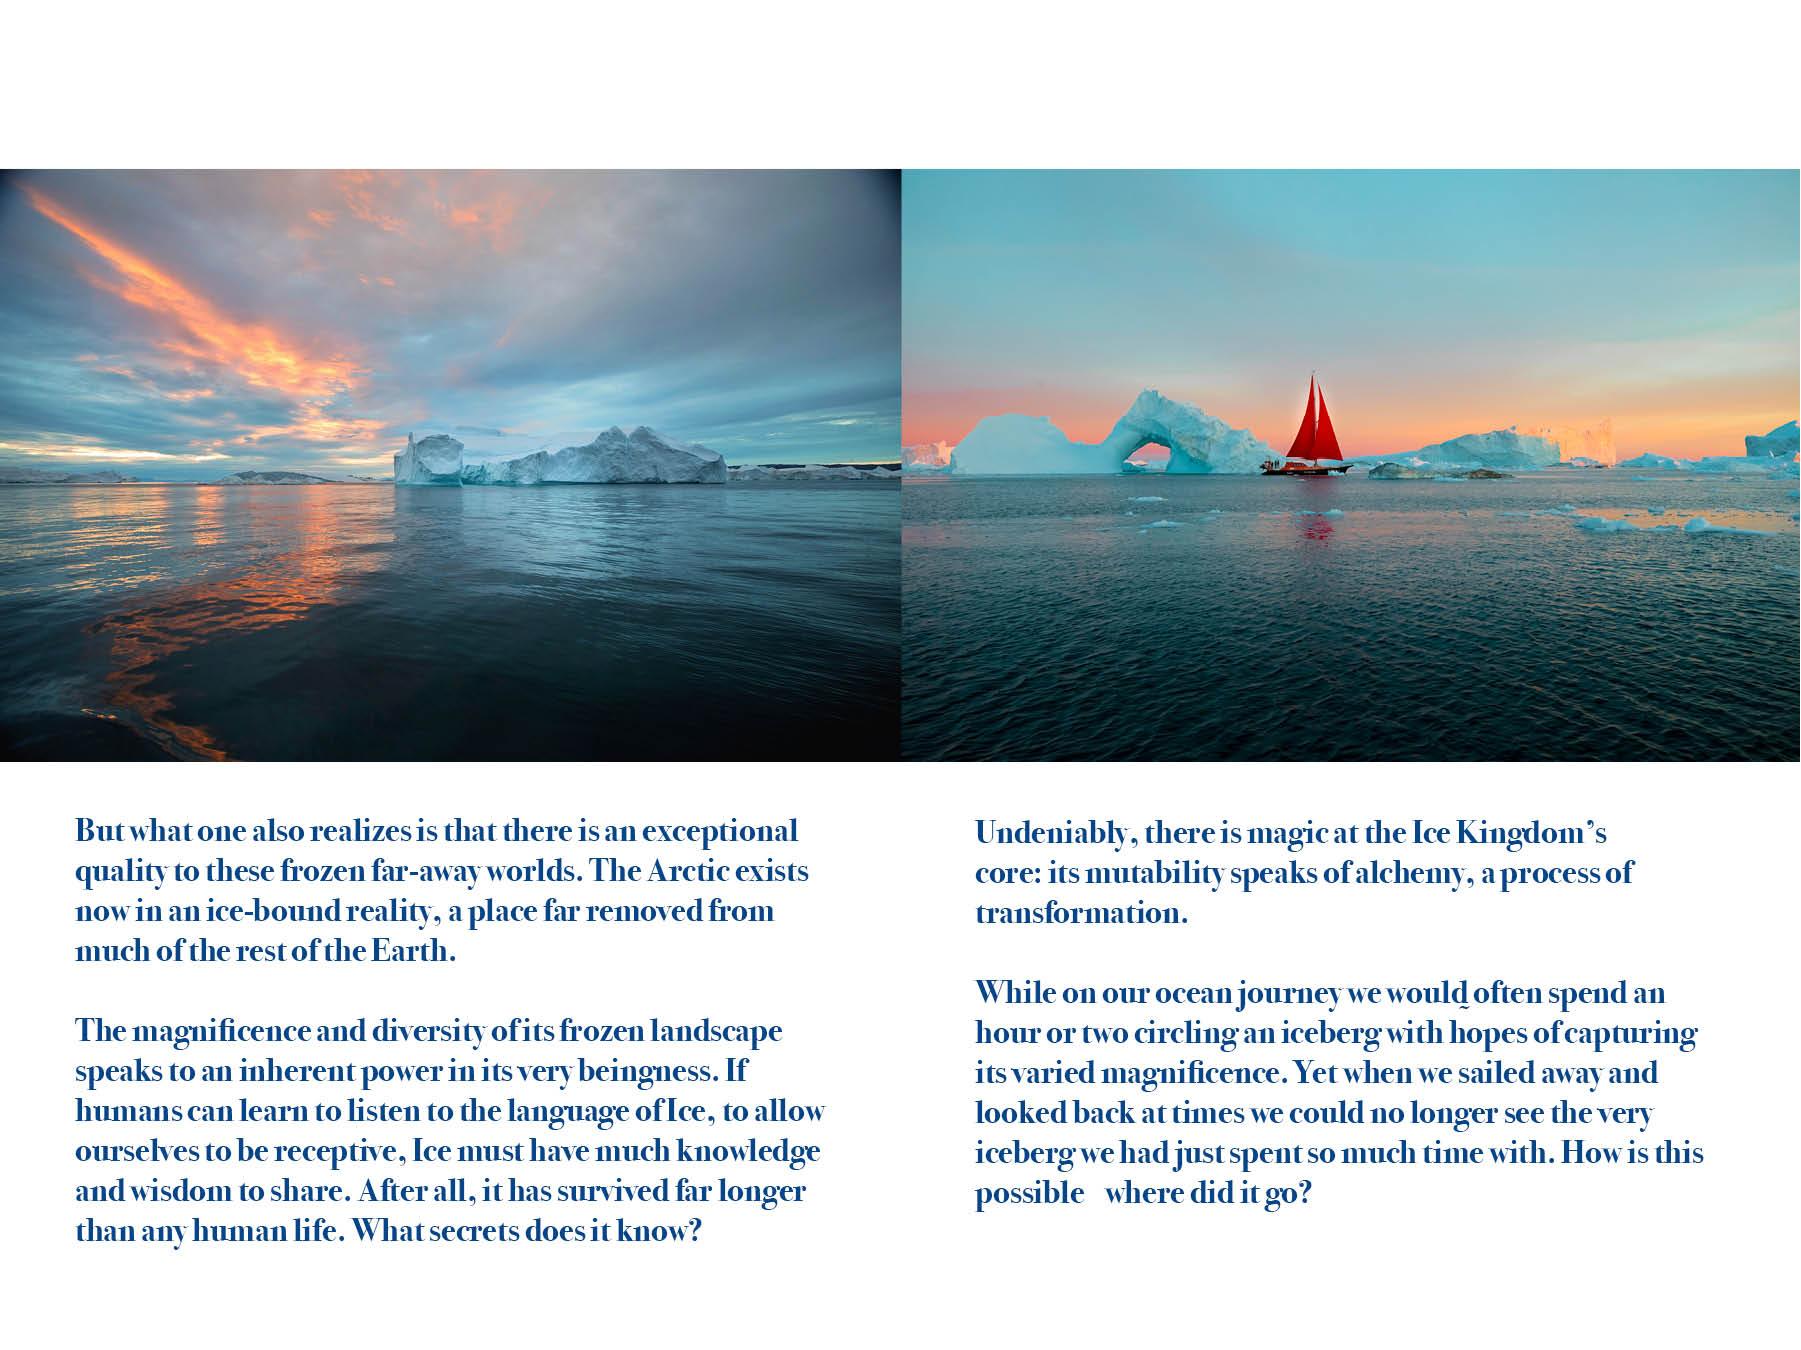 Sailing_Thru_Icebergs_article_11.jpg